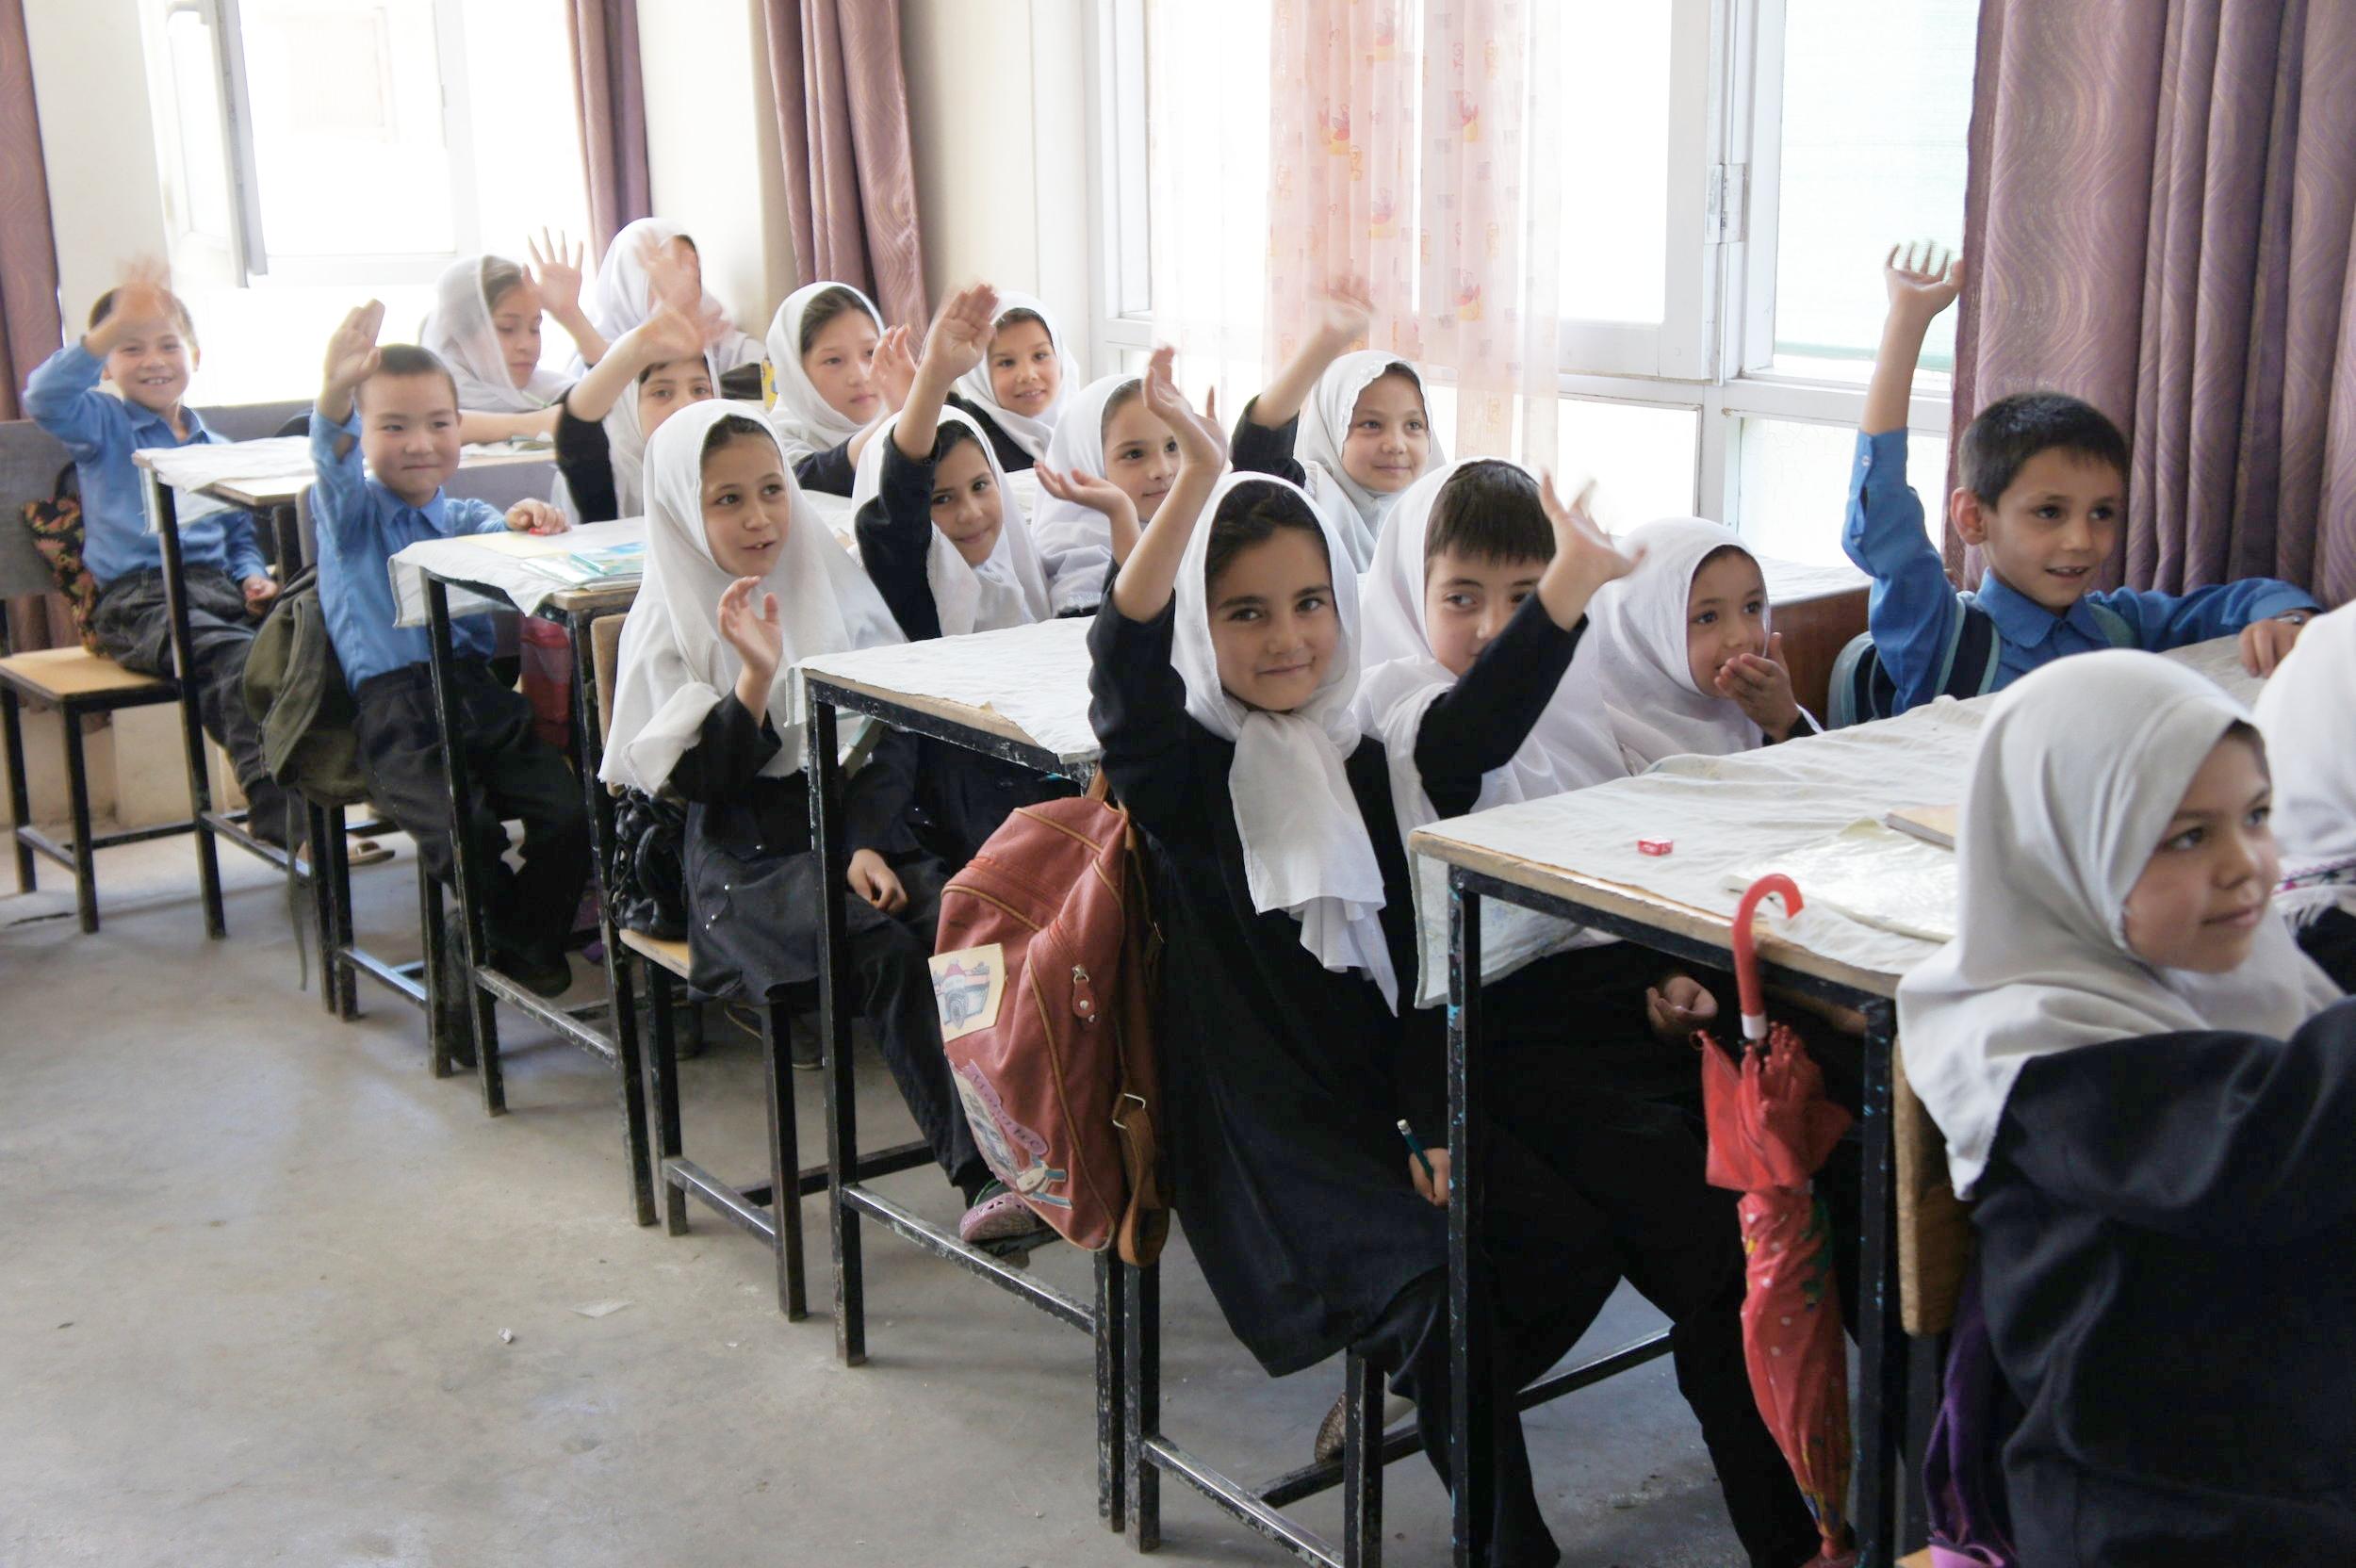 Ali-Shah - #3012 | MaleAge When Starting School: 11